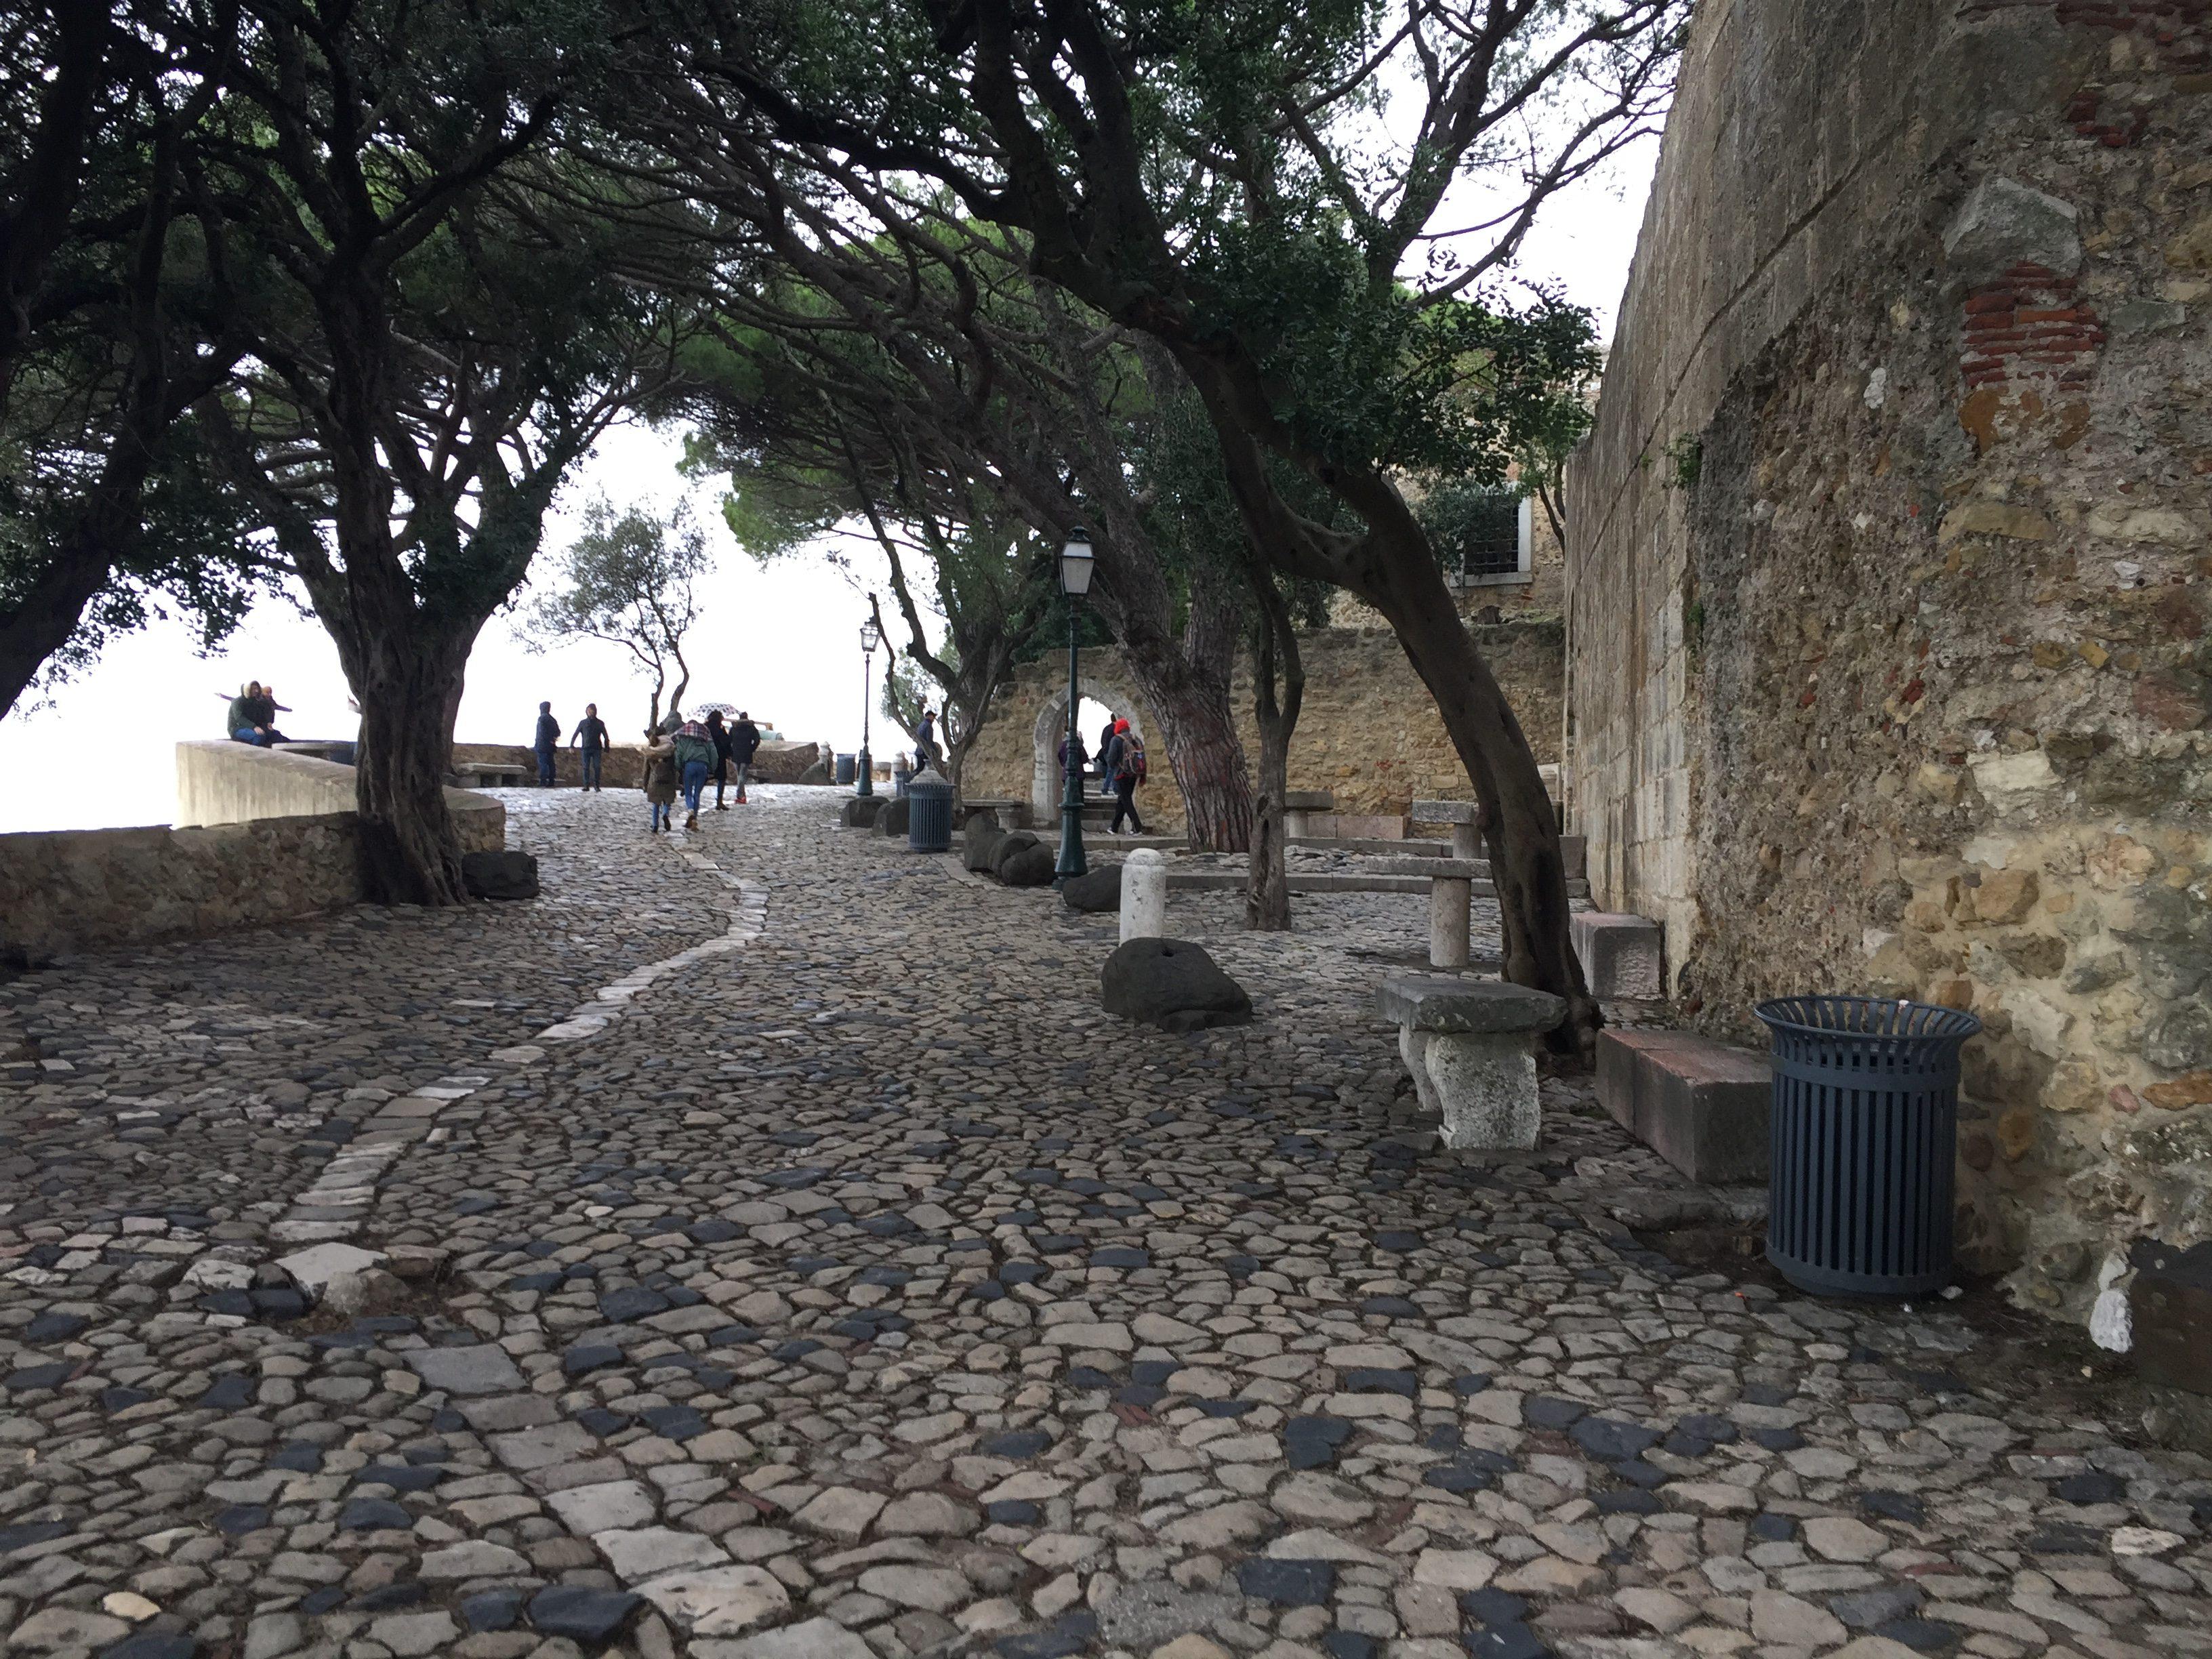 IMG 22731 e1515635521290 - Lugares para visitar en Lisboa (Parte II/II)